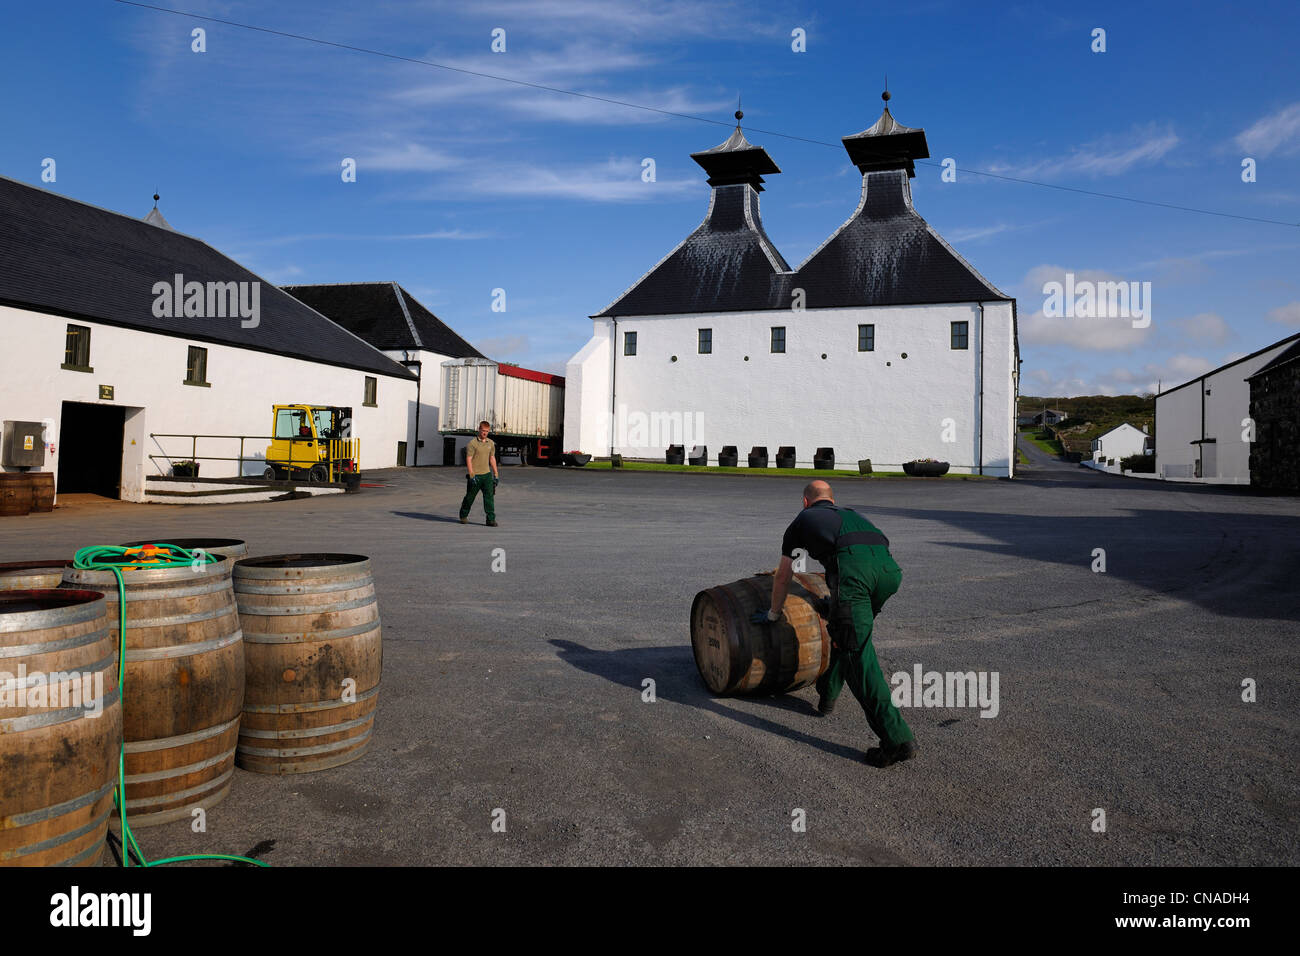 United Kingdom, Scotland, Inner Hebrides, Islay Island, Port Ellen, Ardbeg Scotch whisky distillery - Stock Image